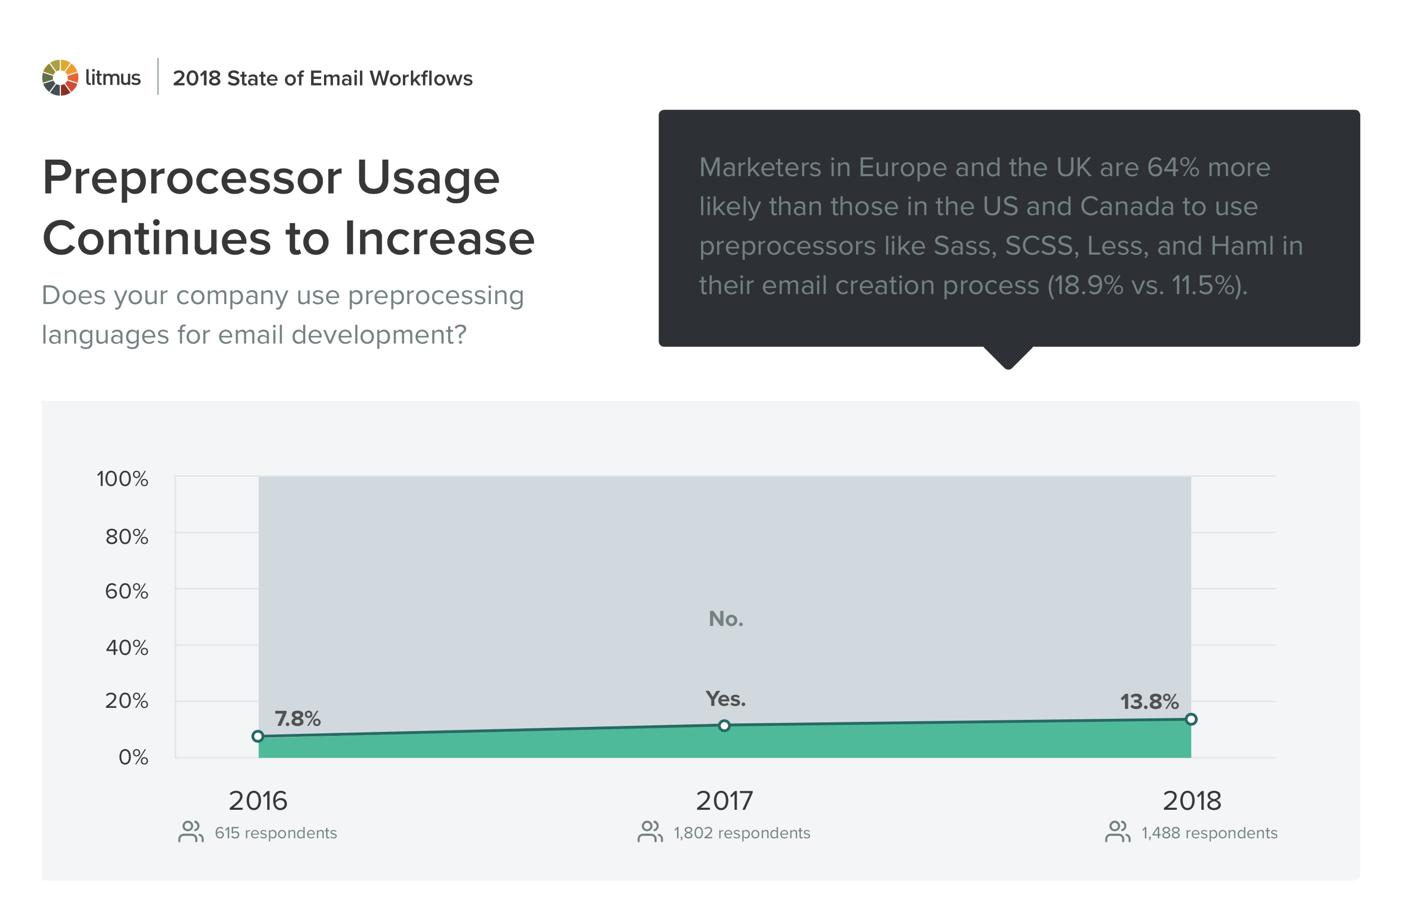 Preprocessor Usage Continues to Increase